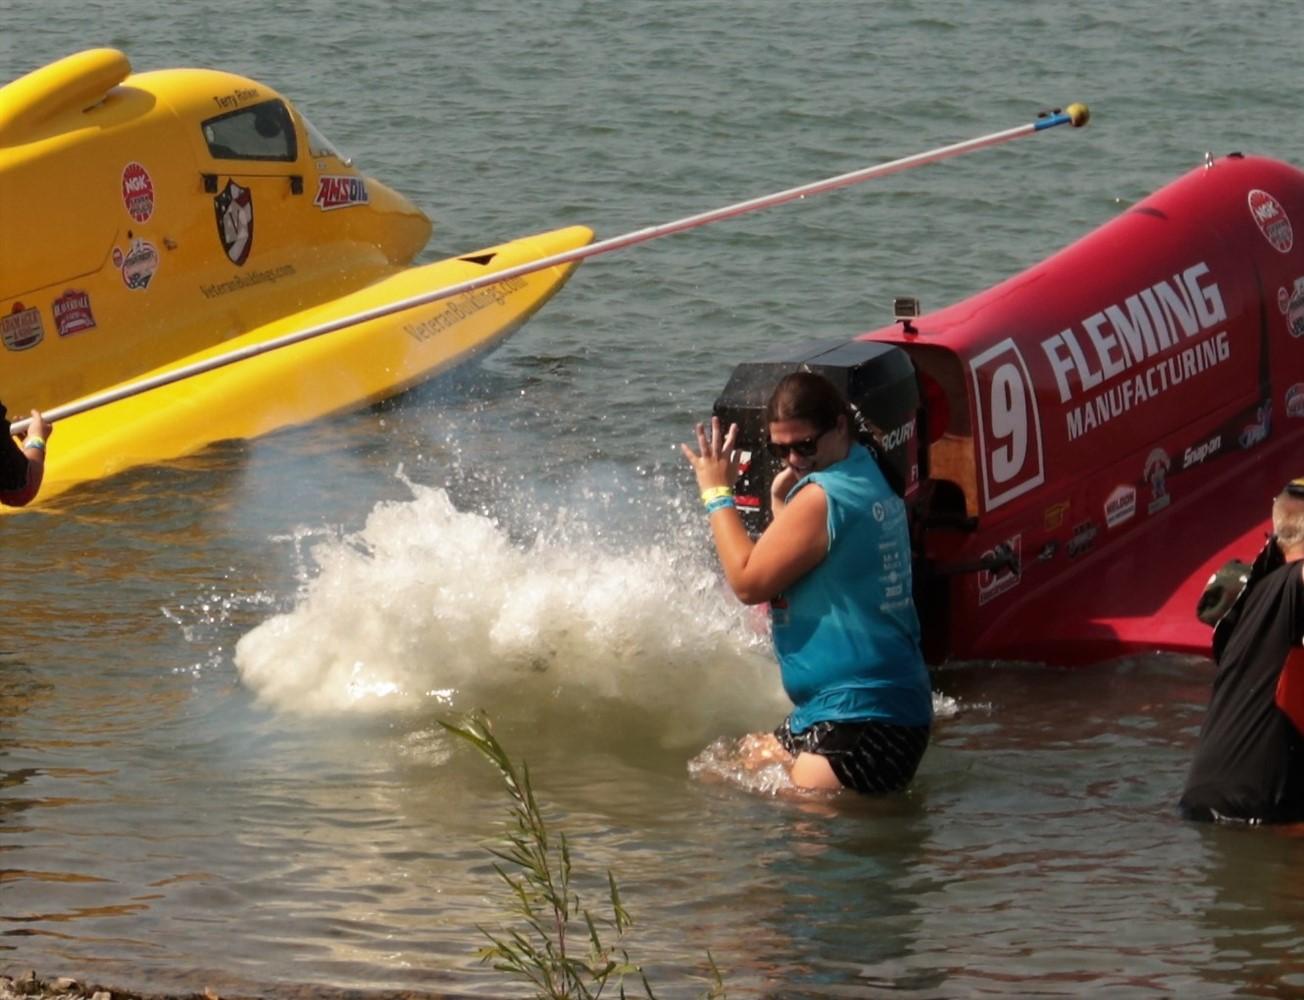 2017 08 26 233 Springfield OH Boat Races.jpg